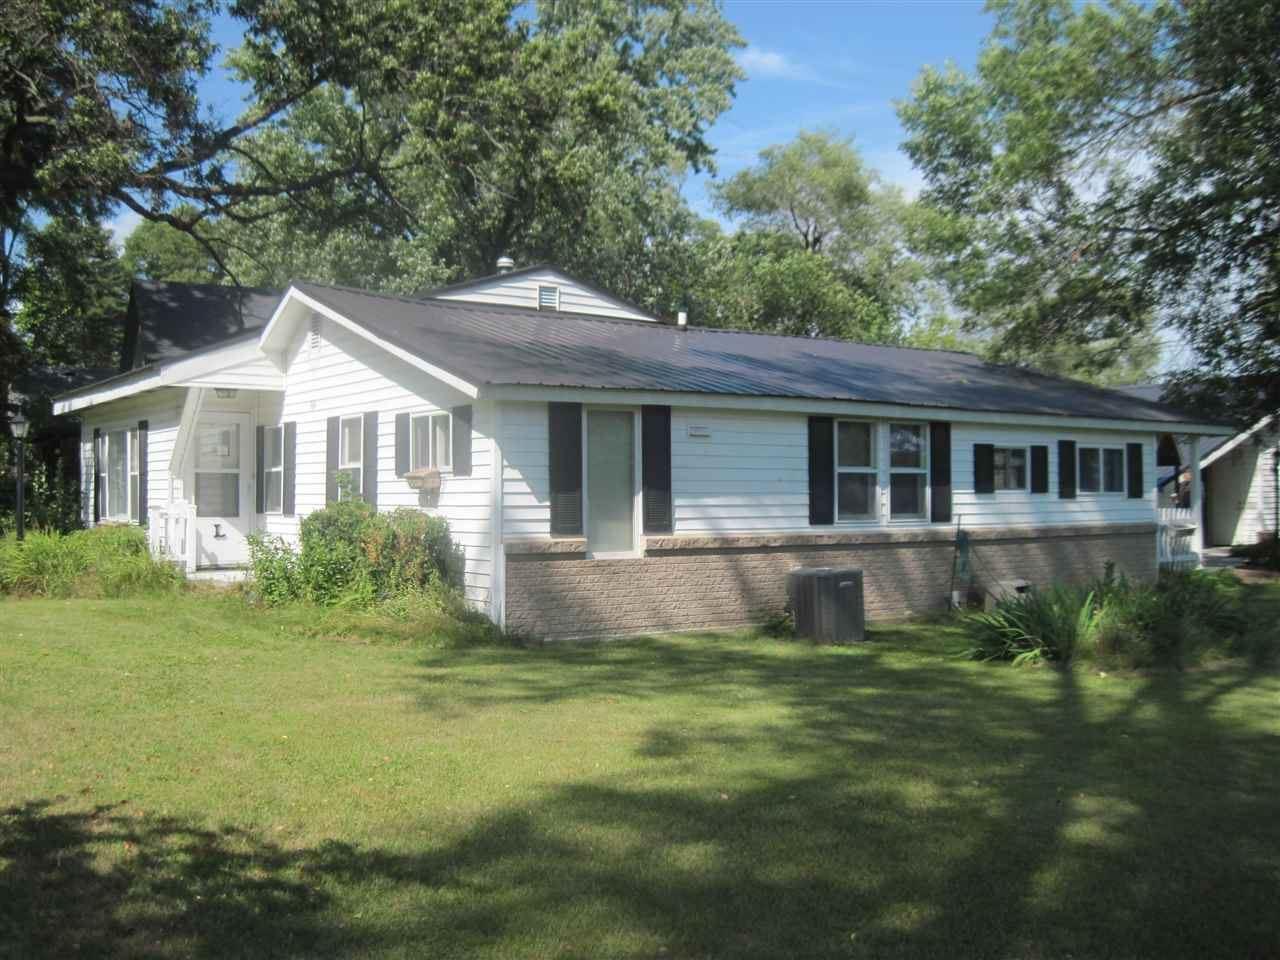 164 S Pine St, Adams, WI 53910 - #: 1890645